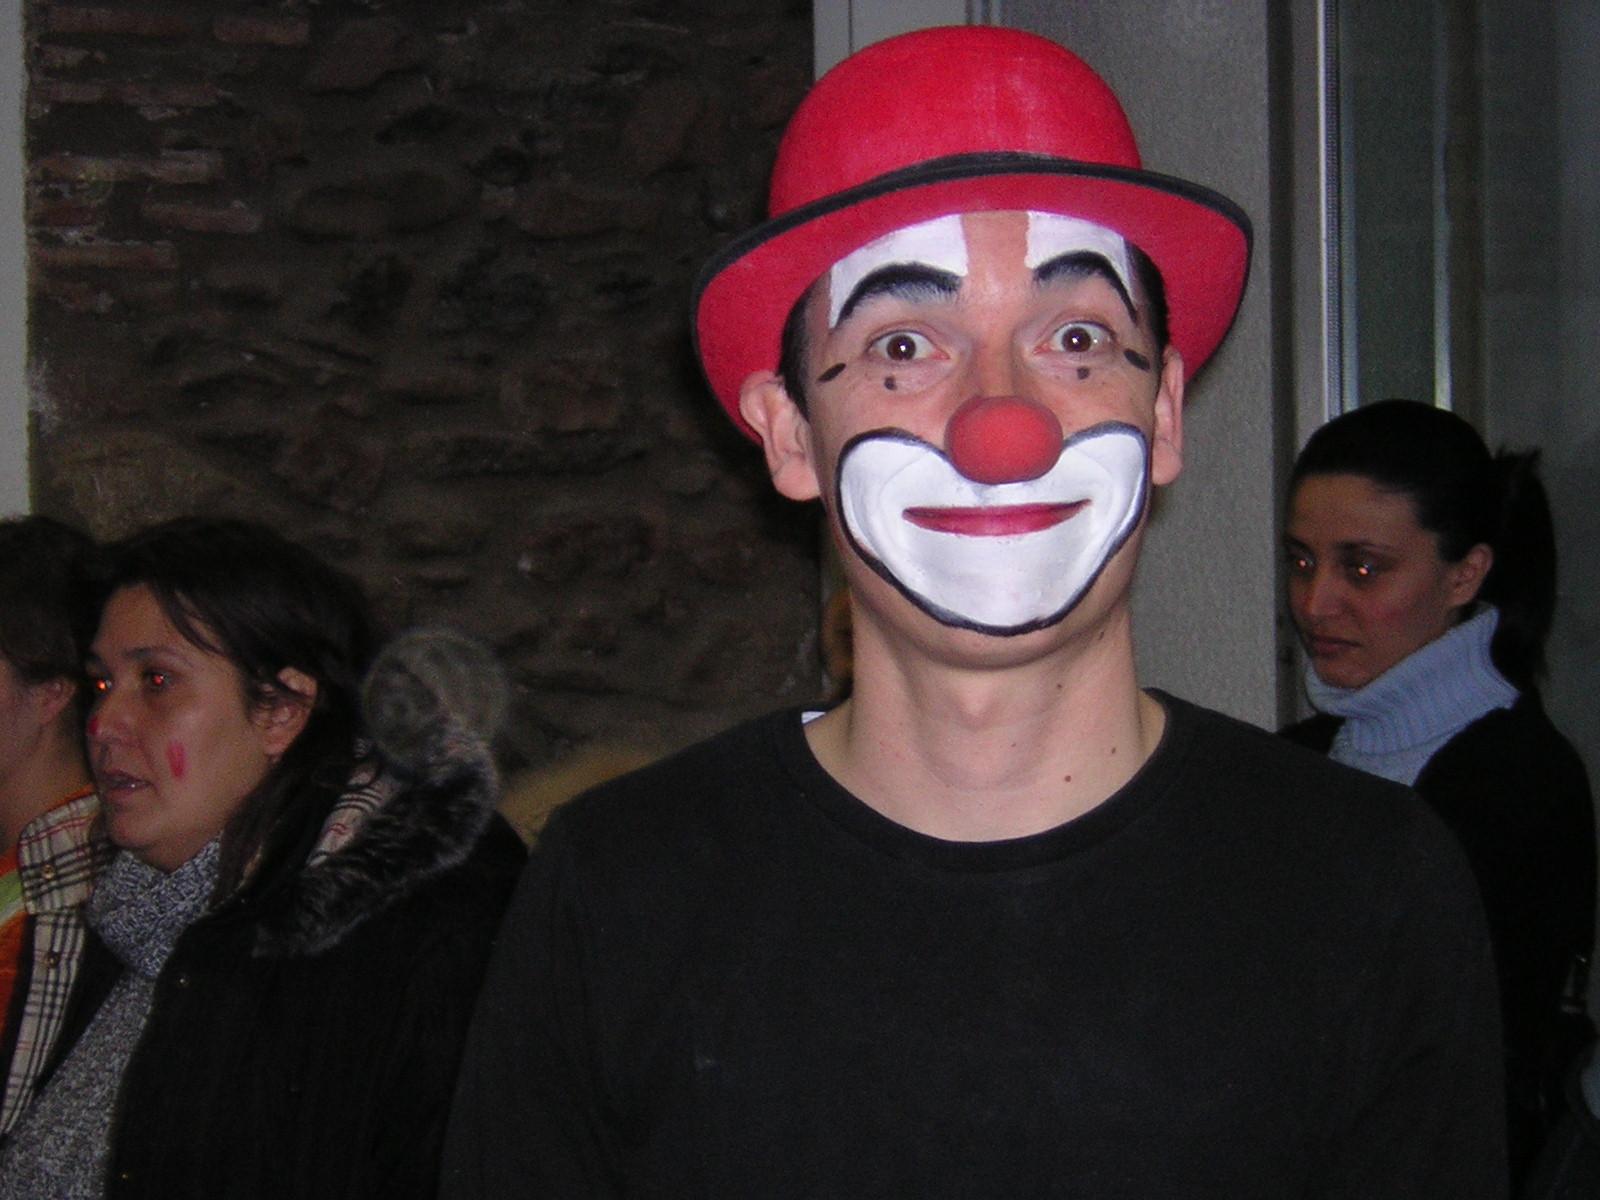 red clown.JPG